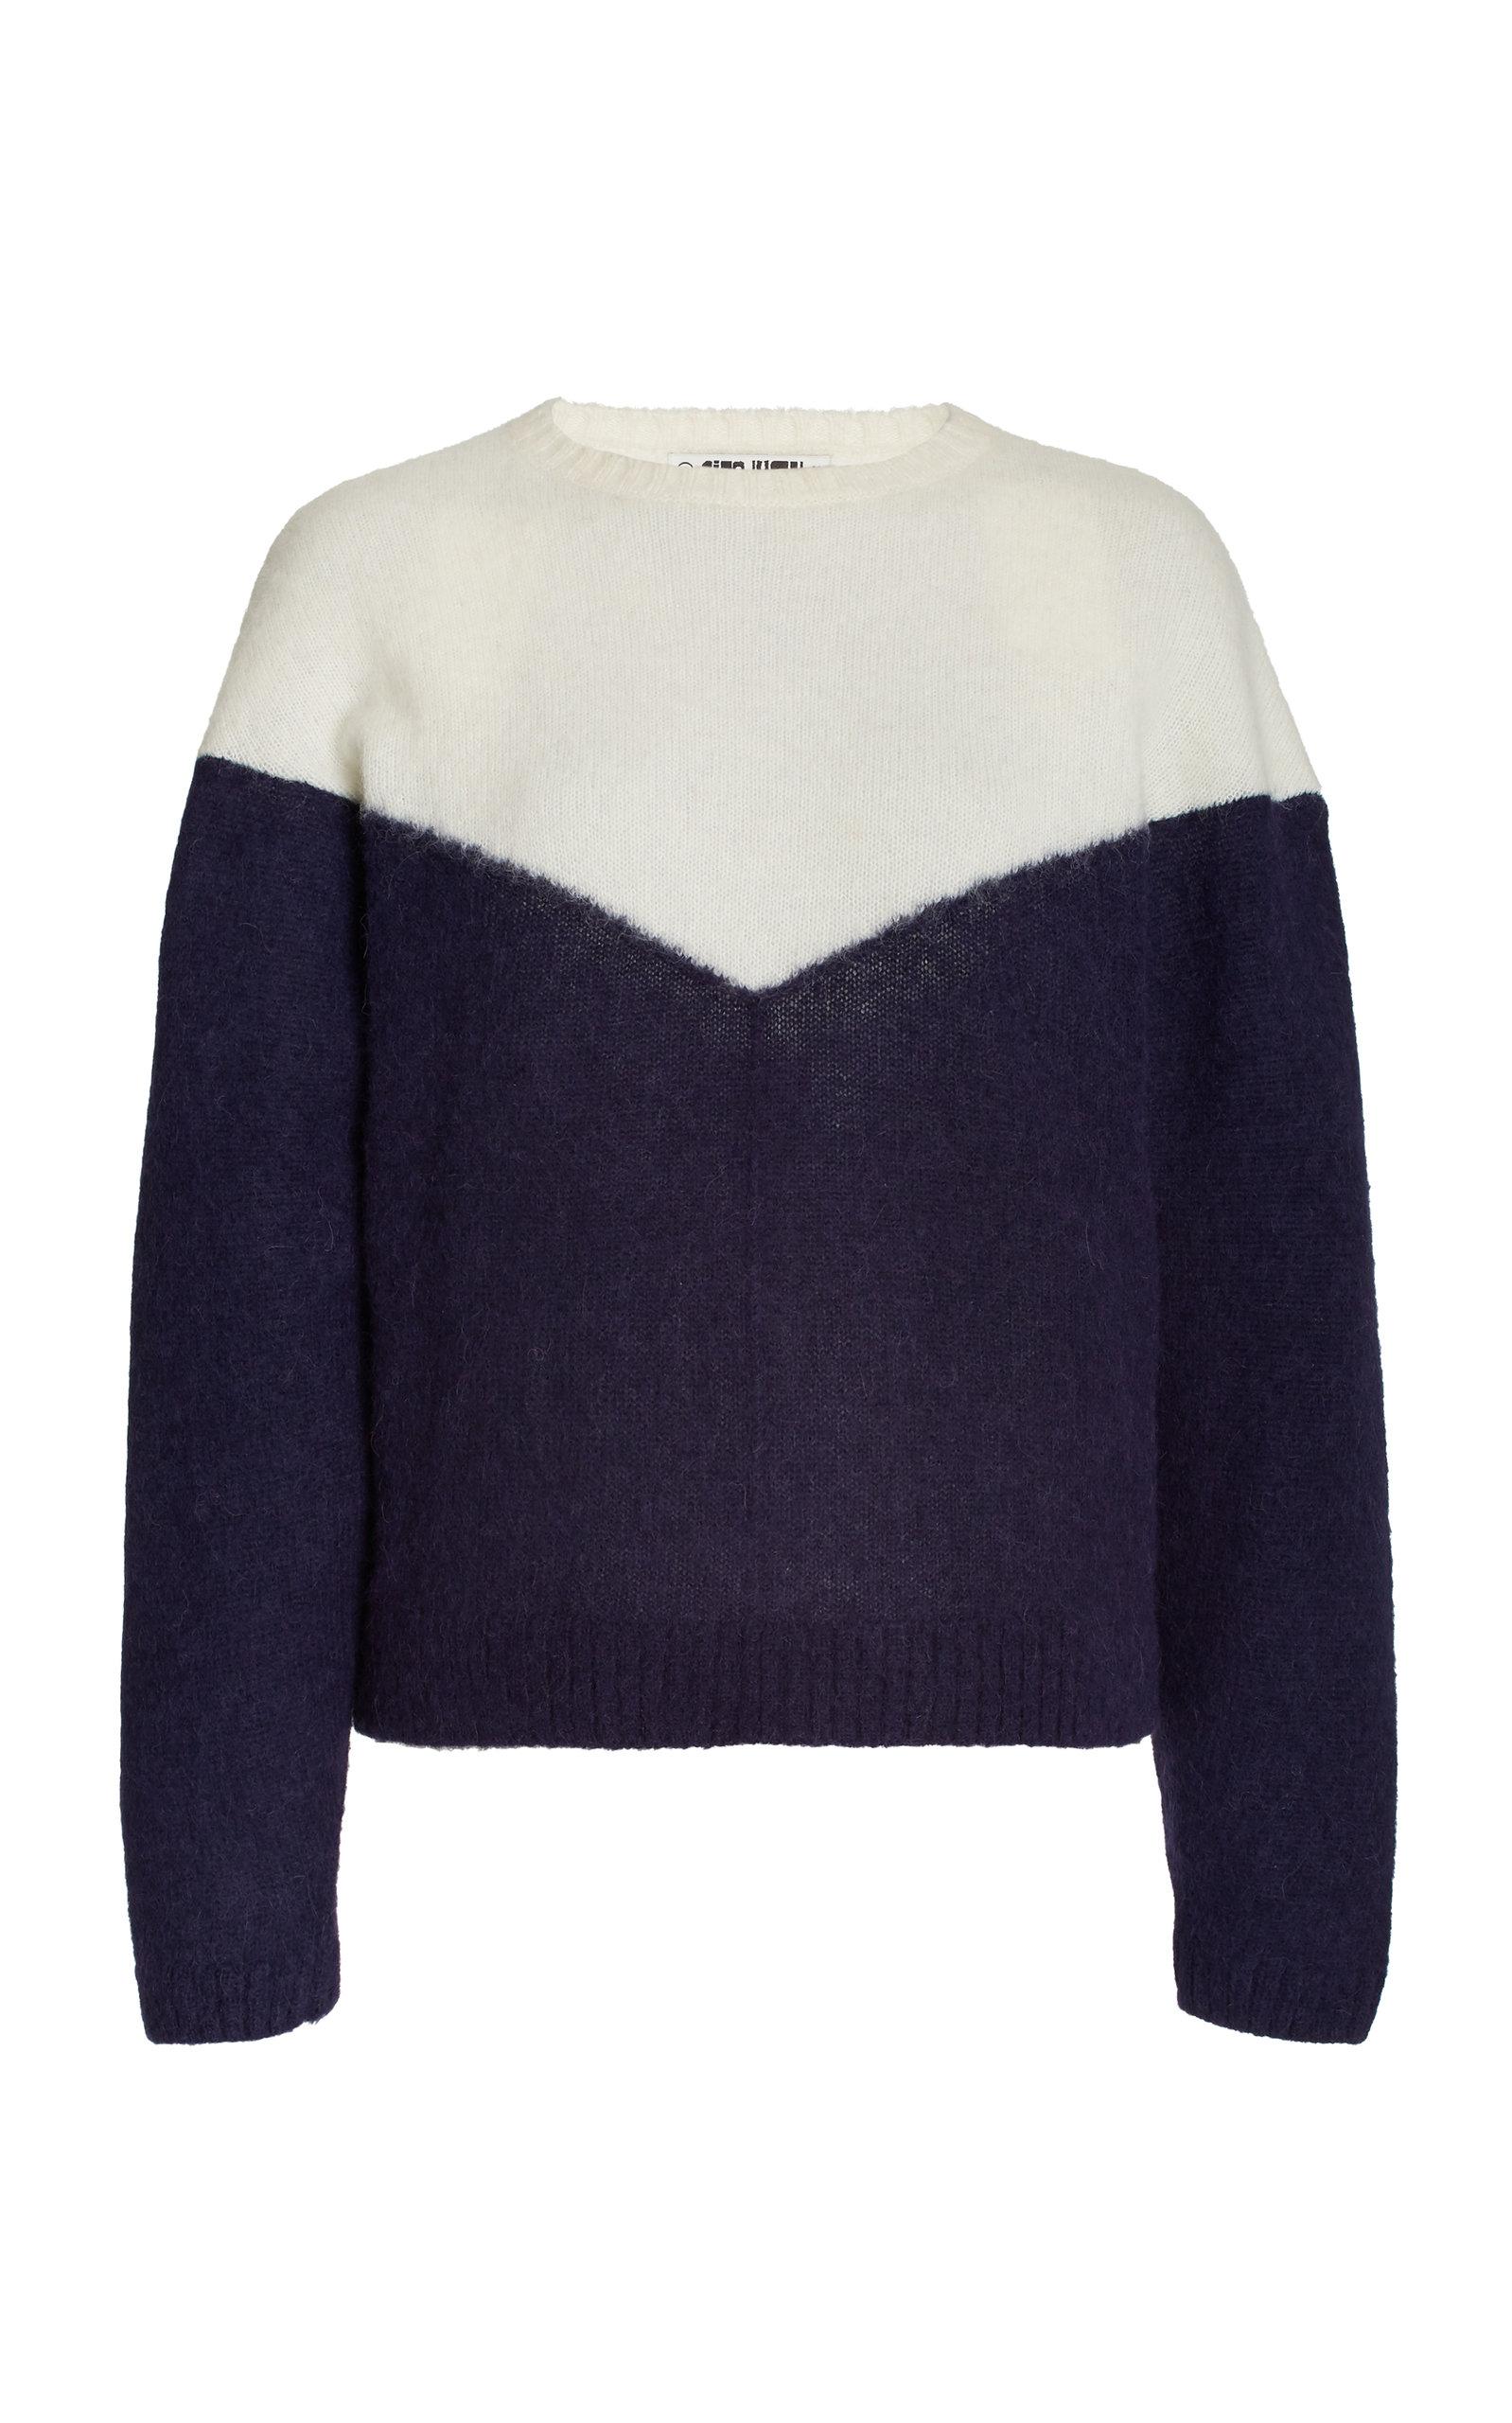 Women's Nonno Two-Tone Alpaca-Blend Knit Sweater